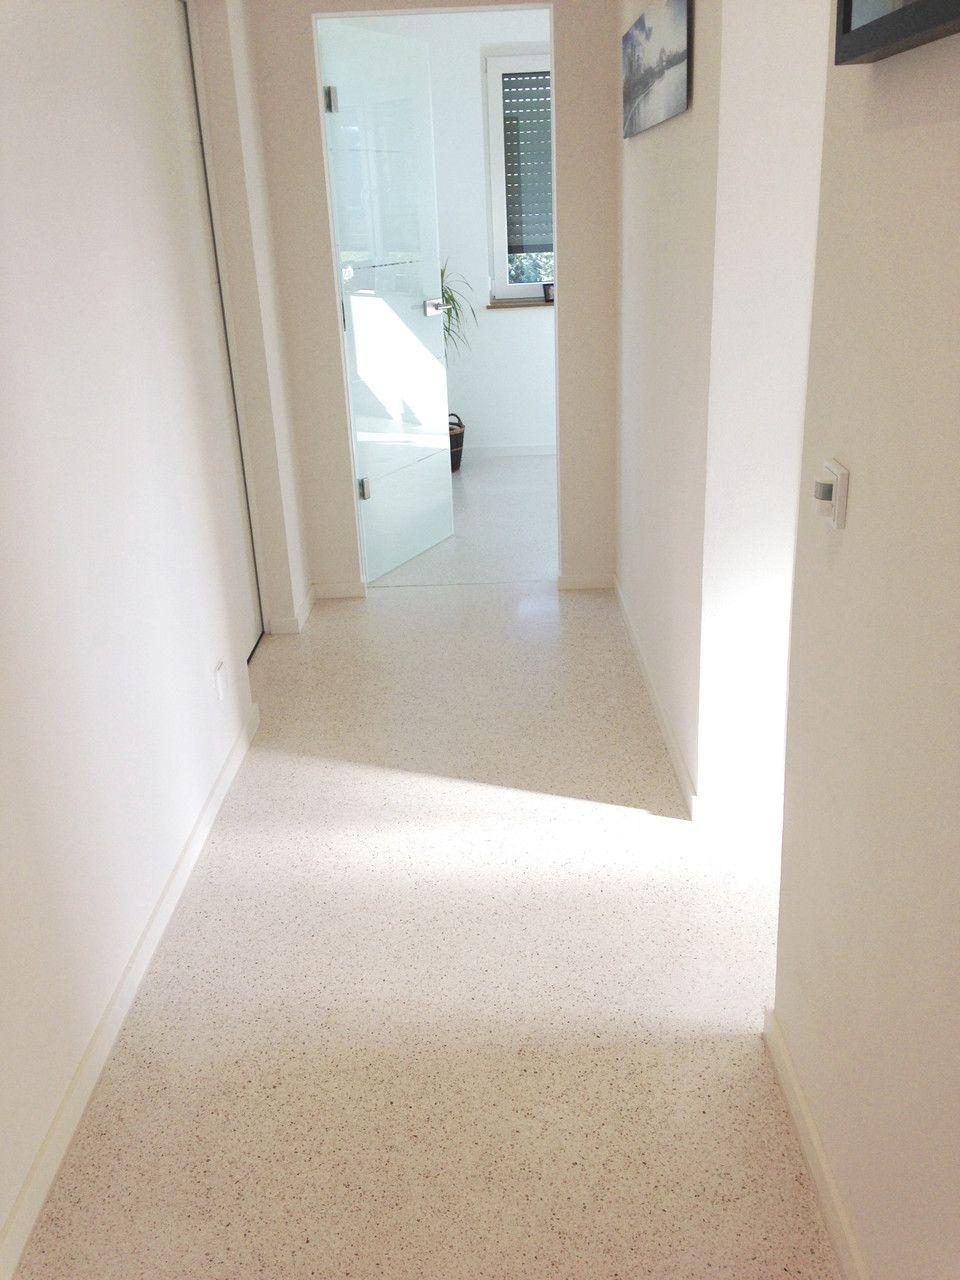 Pin Von Claudia Hoch Auf House Love In 2020 Terrazzo Terrazzo Boden Modern